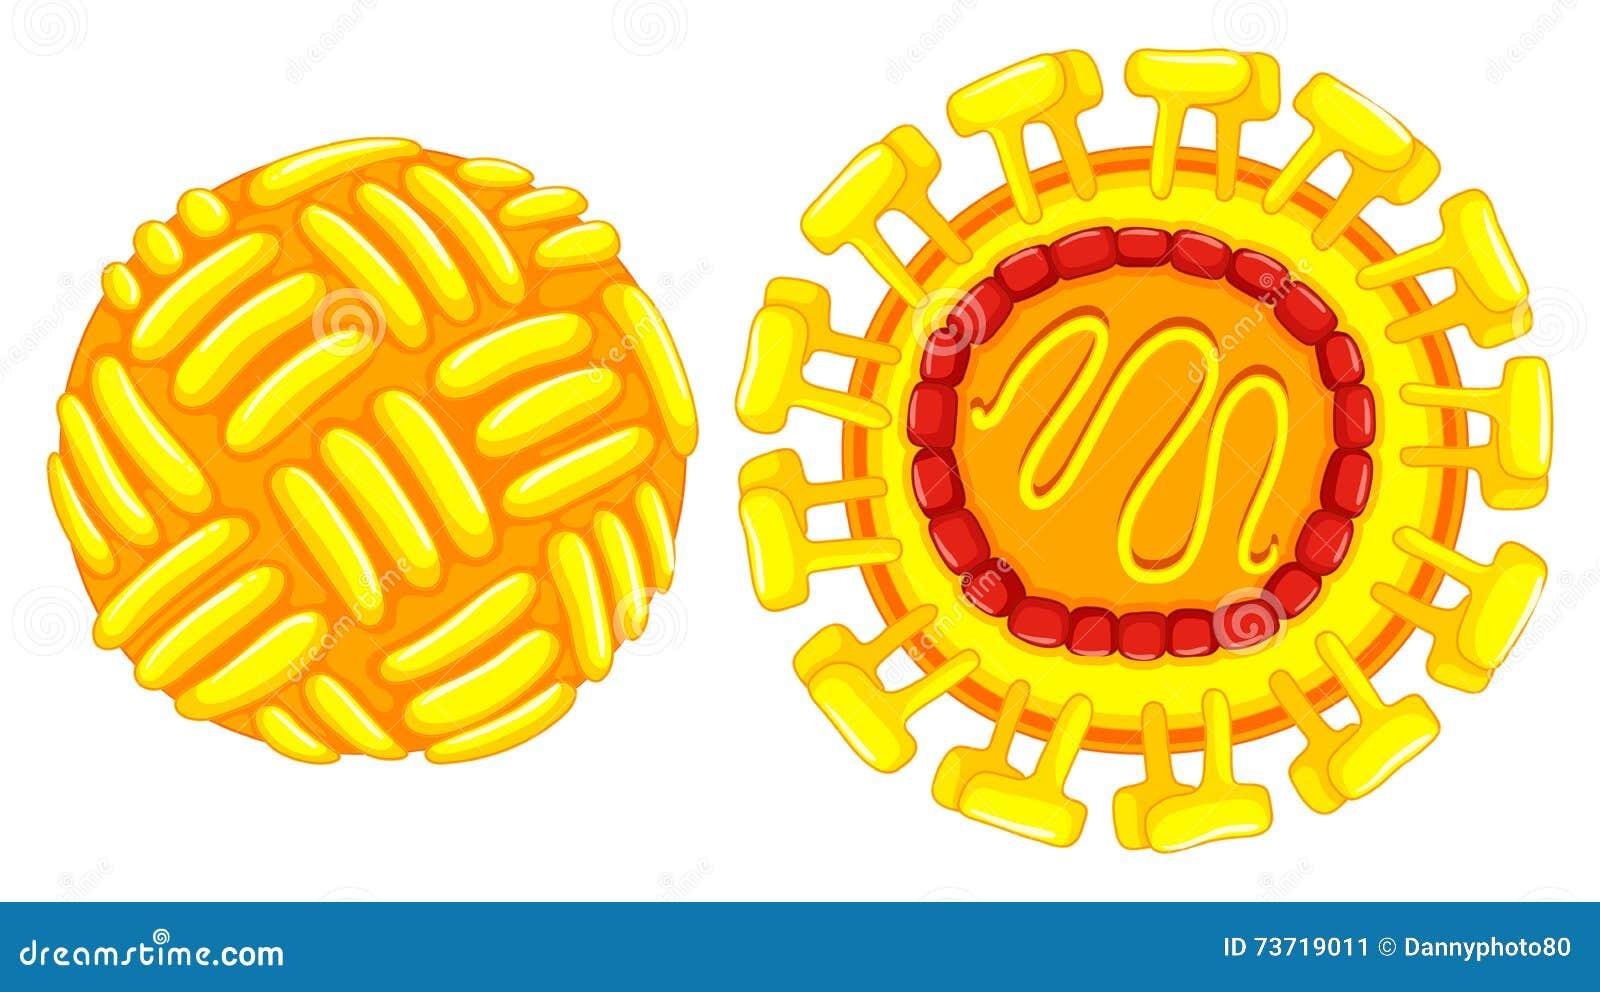 Close Up Diagram Of Zika Virus Stock Vector - Image: 73719011